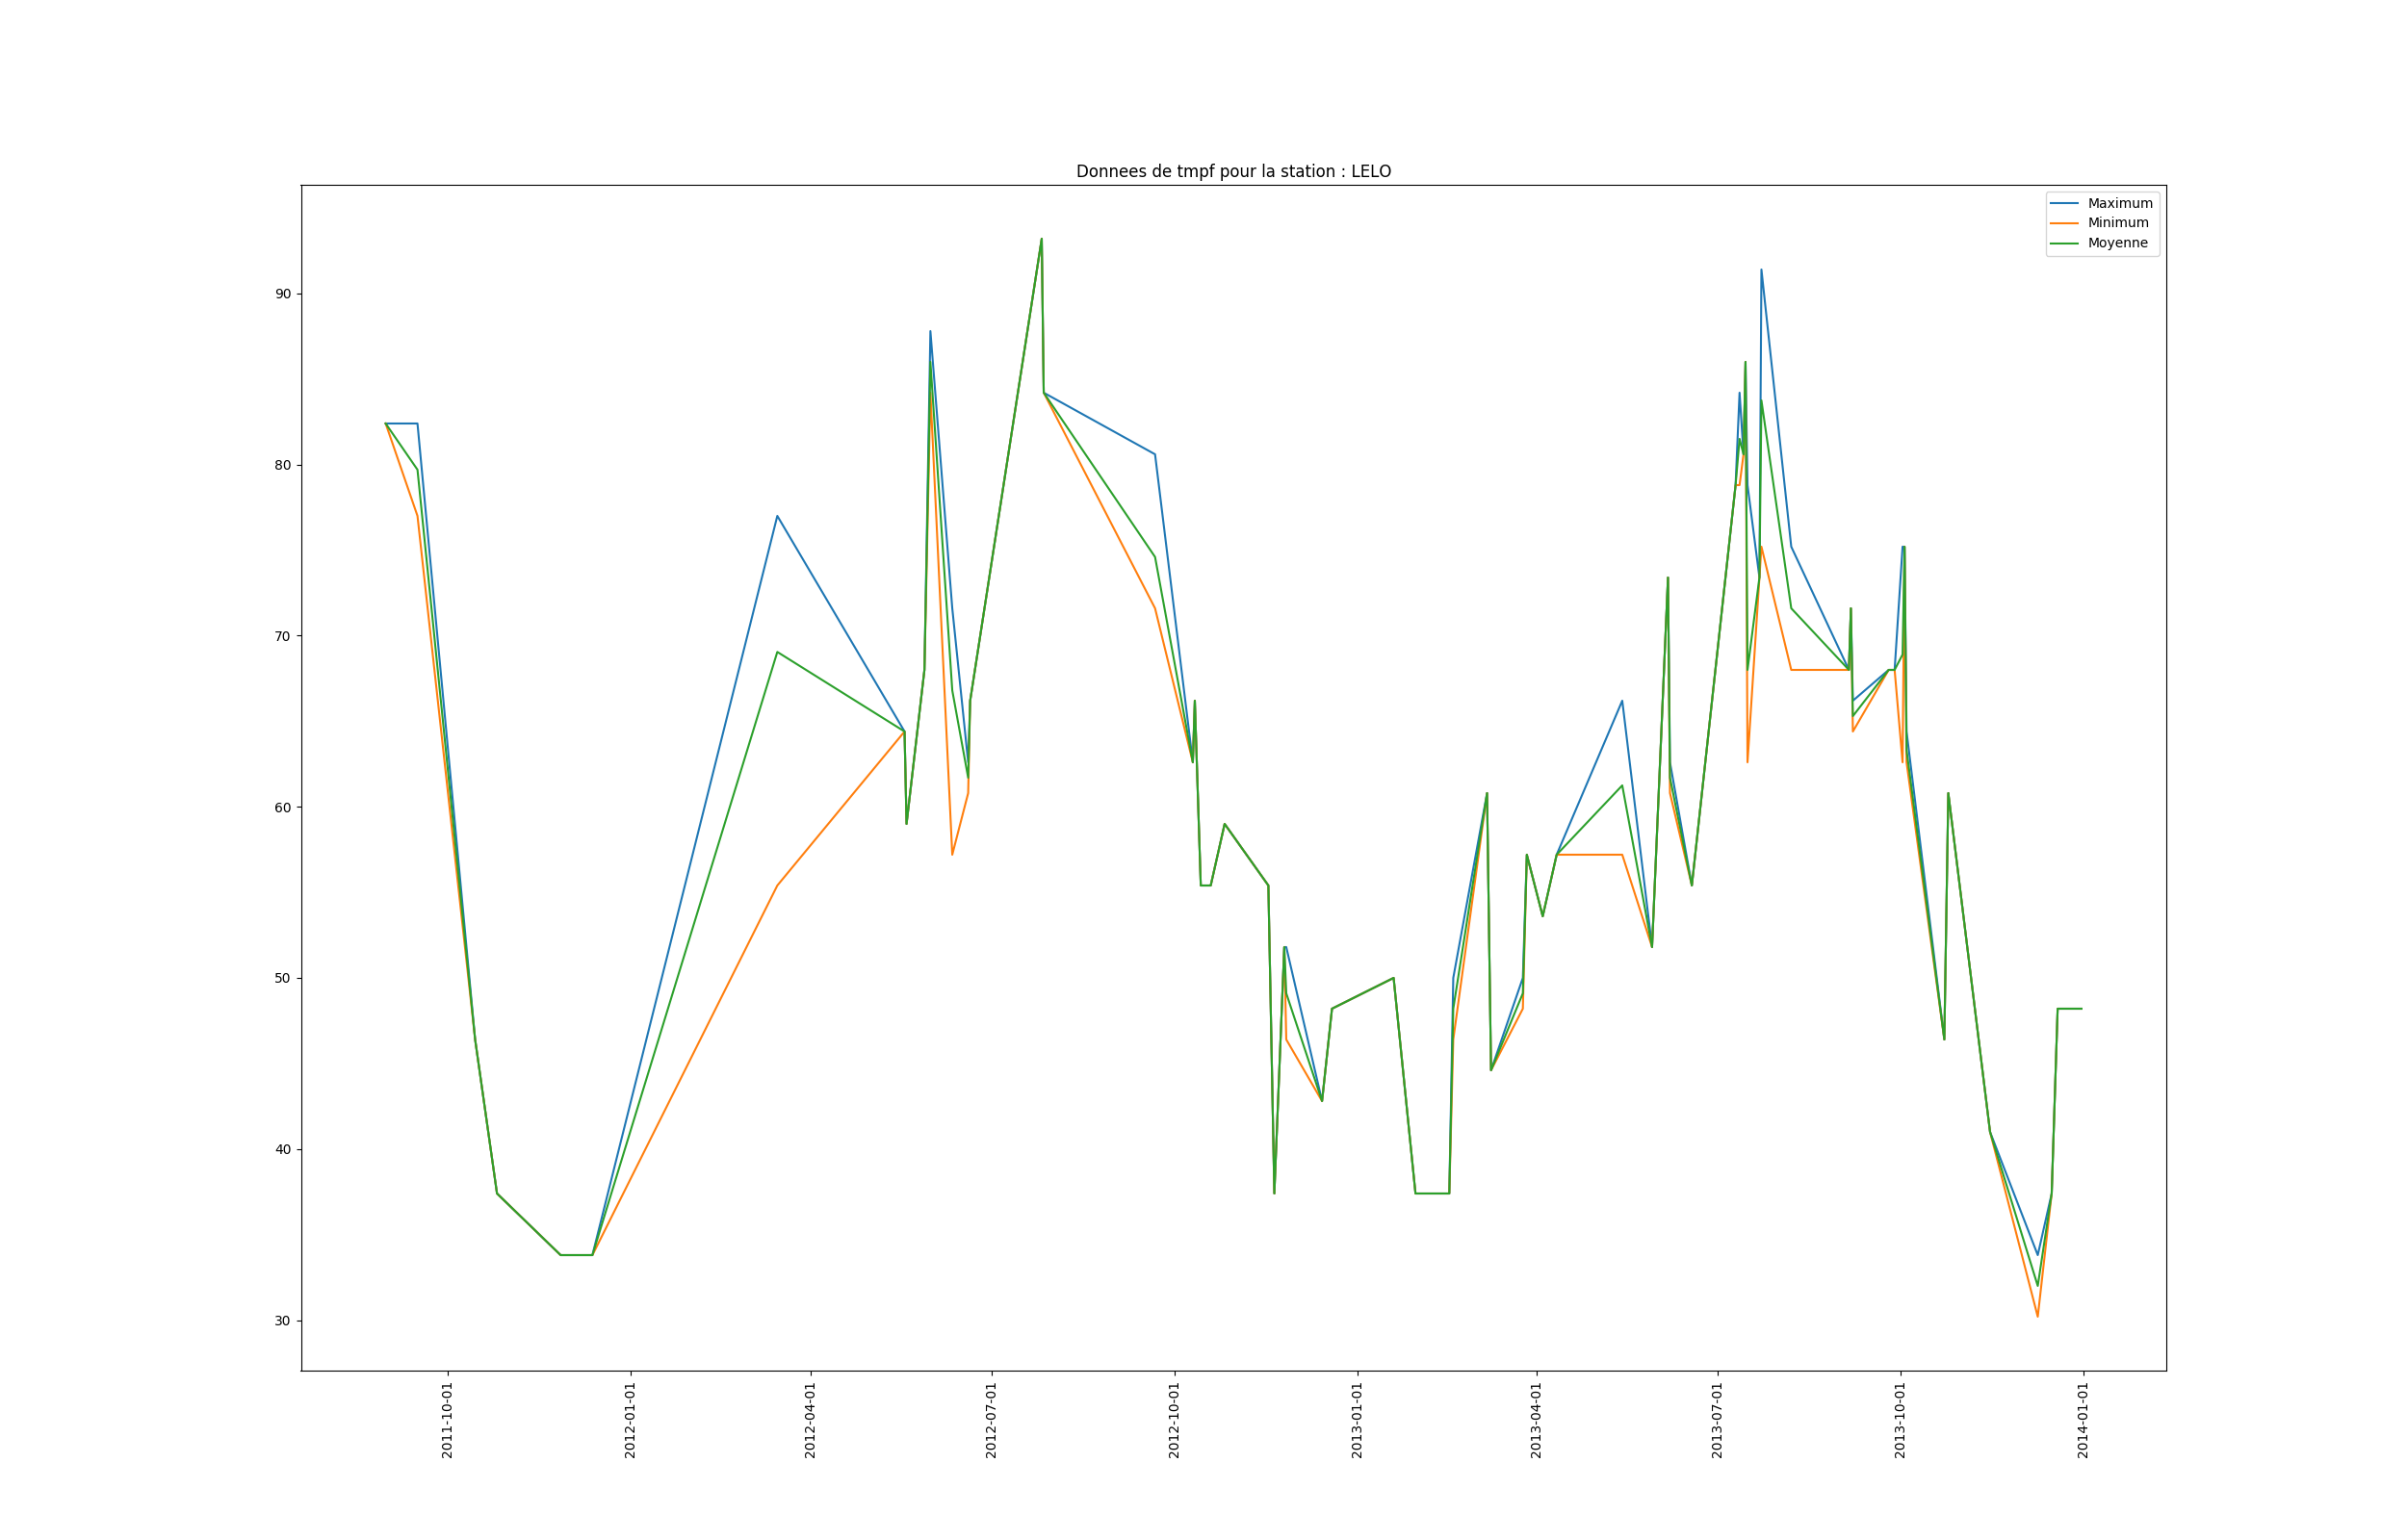 livrables/Rapport-LATEX/figures/graph_LELO_tmpf_byday.png